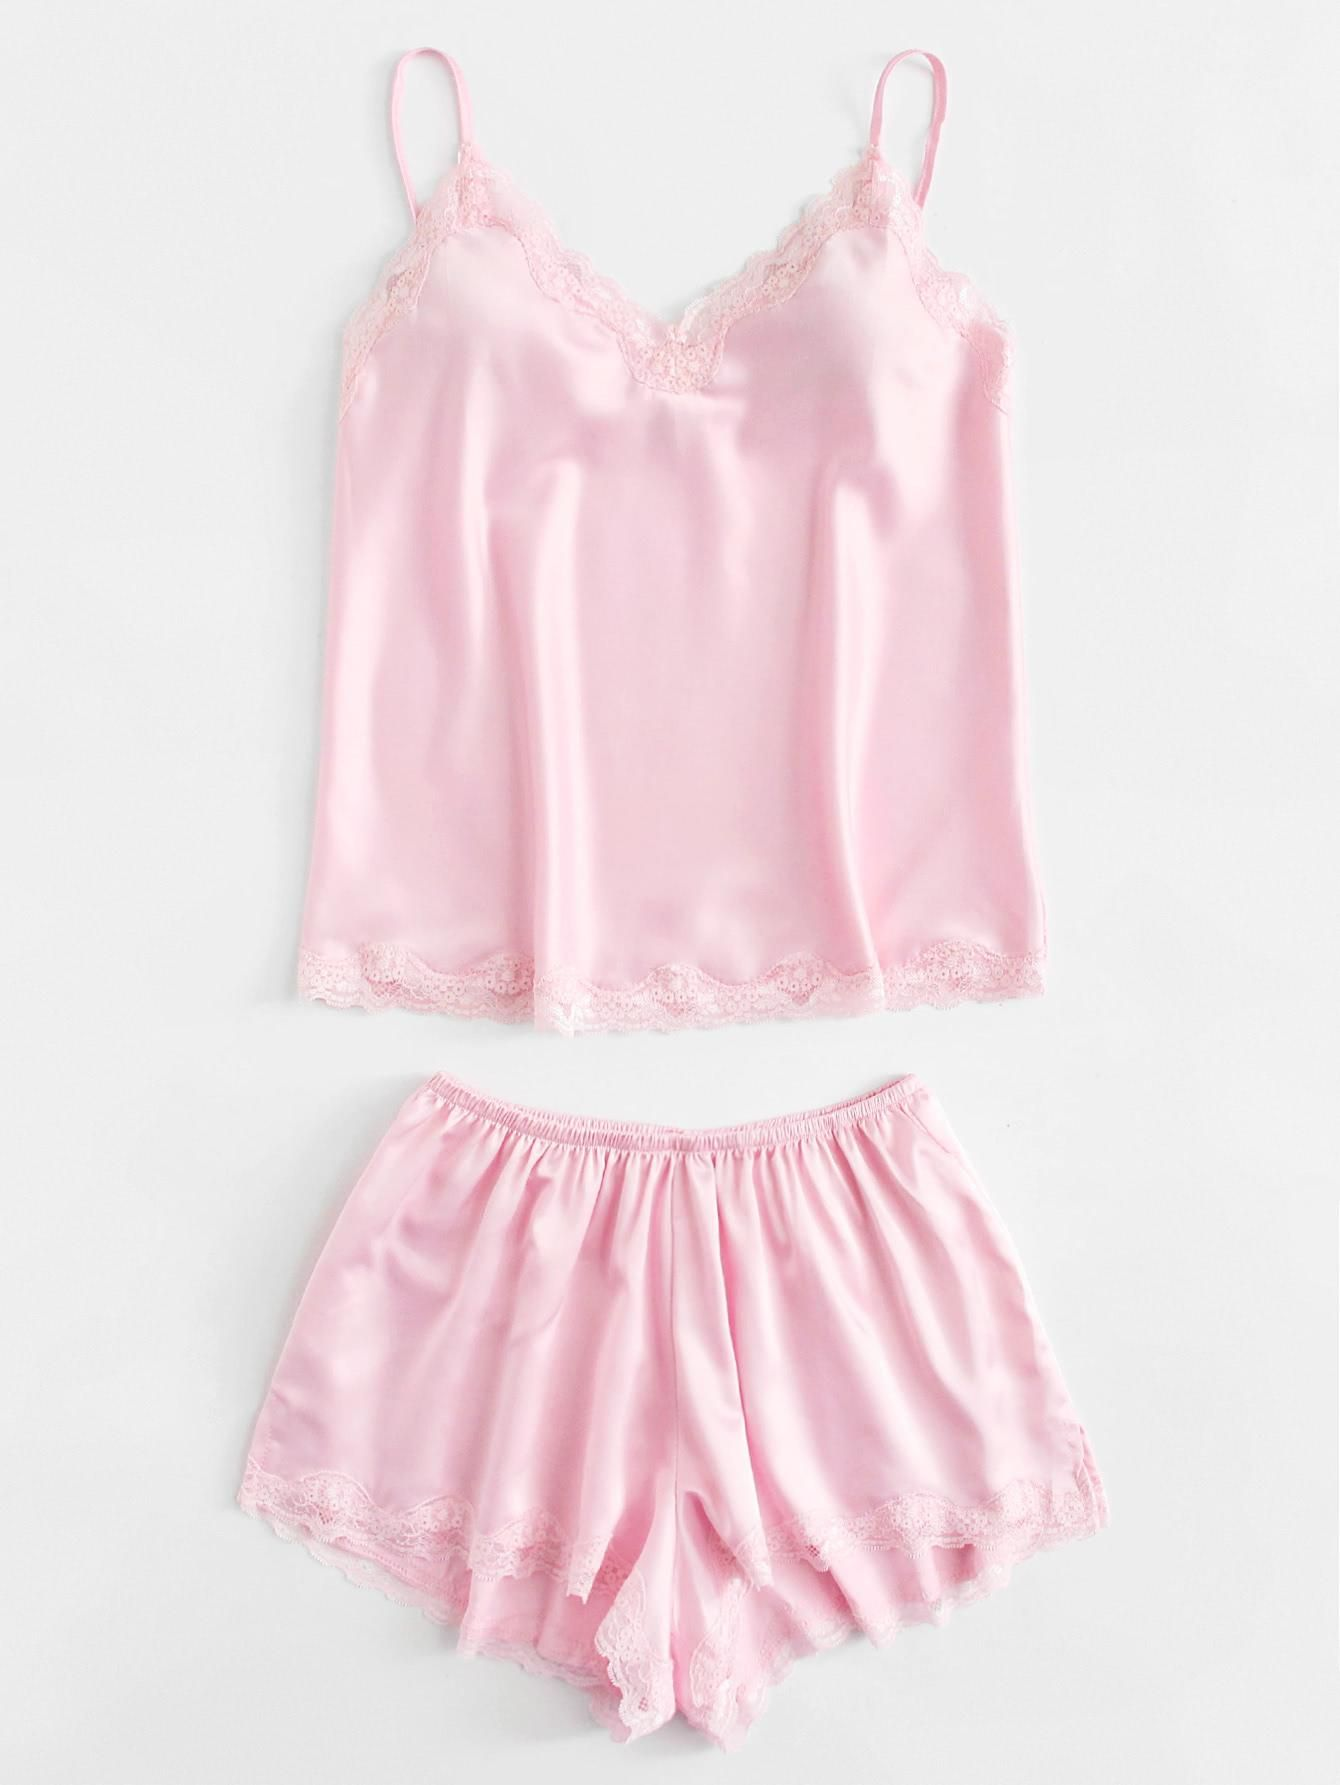 b4ac352b57 #Valentines #AdoreWe #ROMWE - #ROMWE Contrast Lace Satin Cami & Shorts Set  - AdoreWe.com